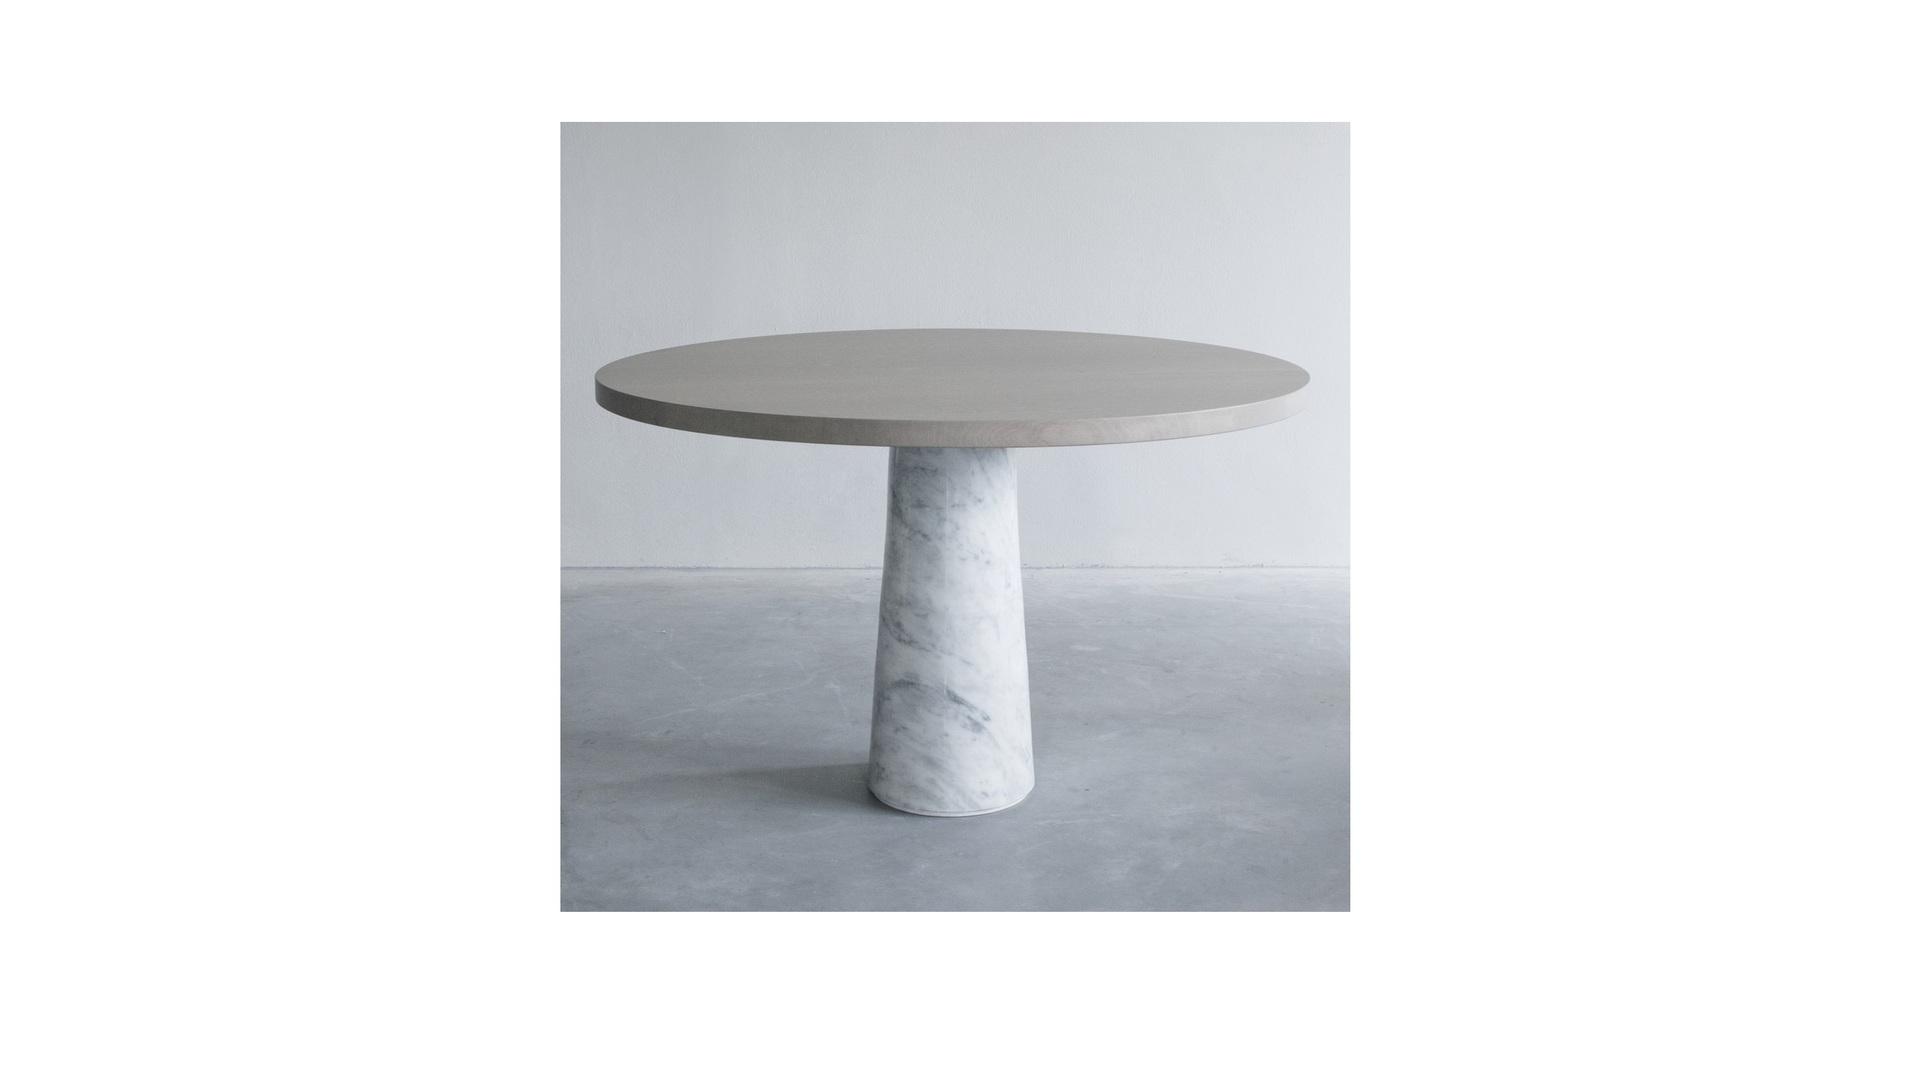 Stone table with Carrara marble (2) klein.jpg